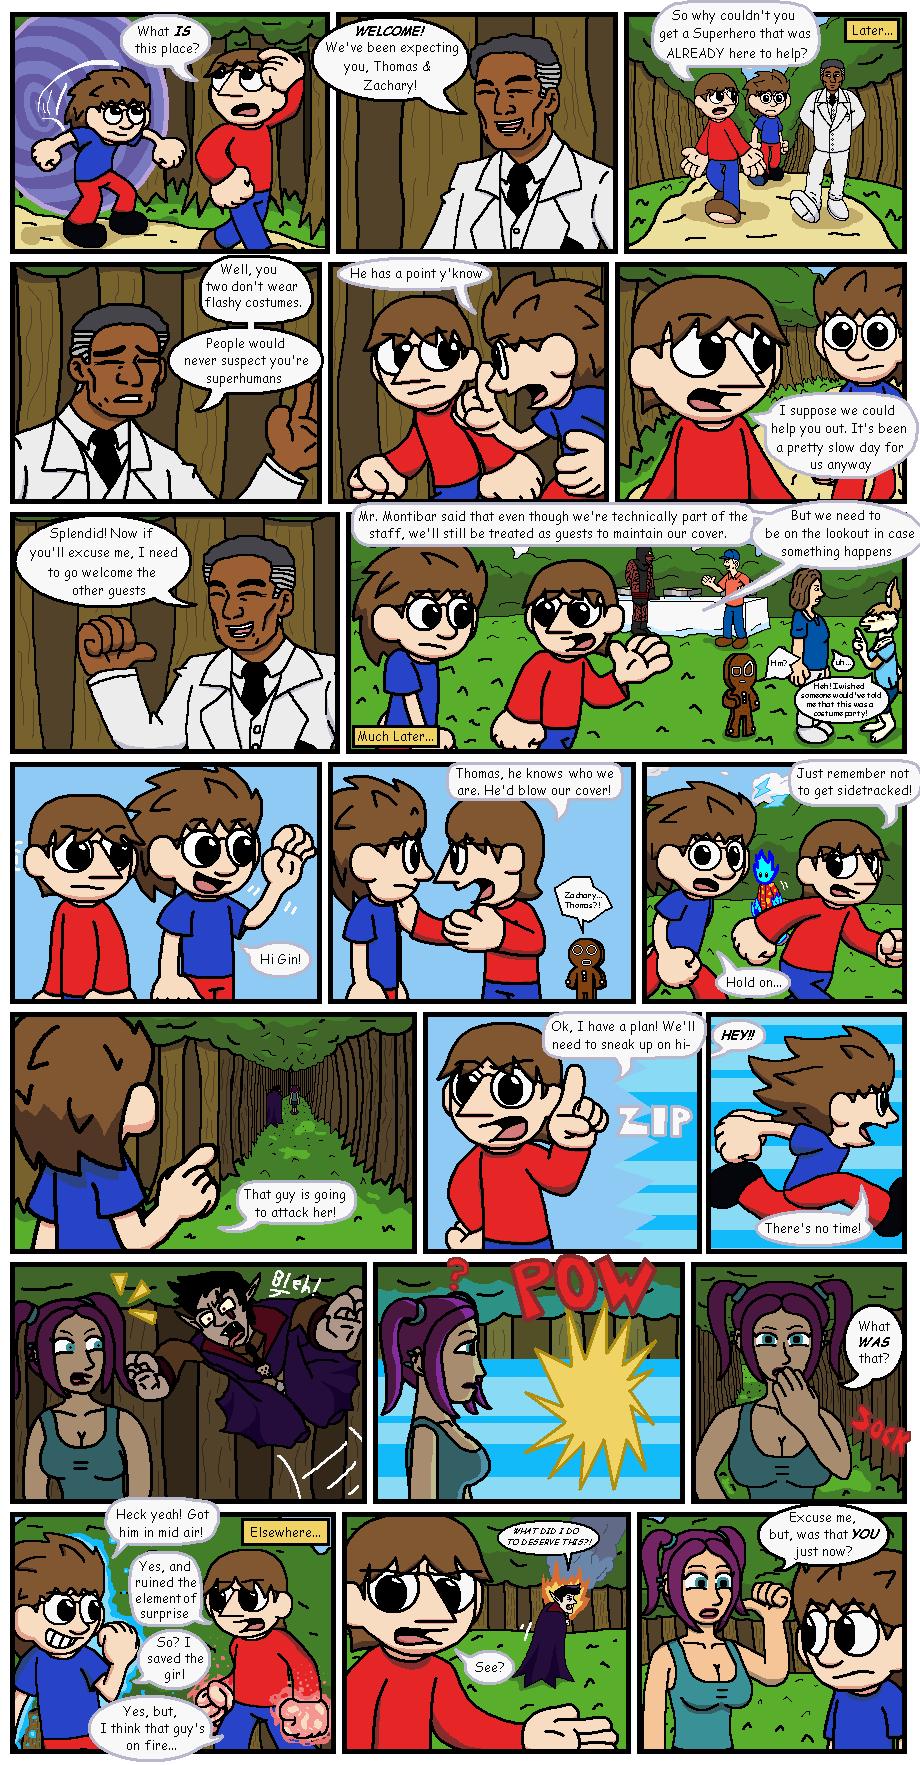 The Halloween Caper (2014) part 2